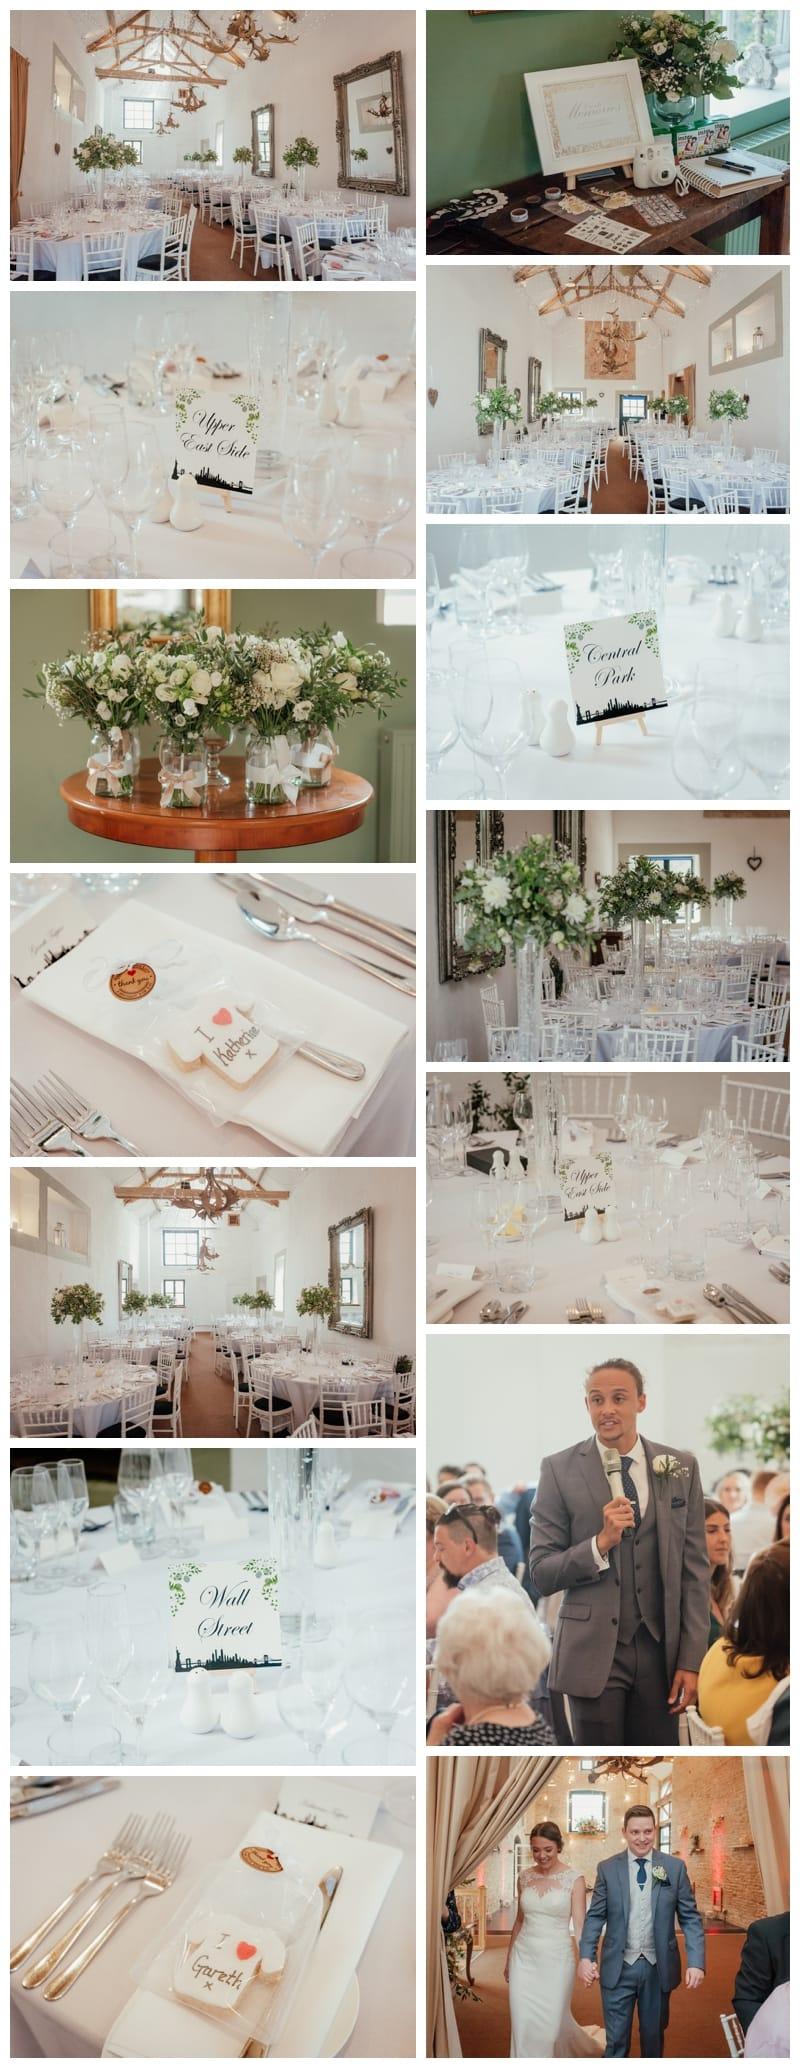 The White Barn Wedding Breakfast Set Up